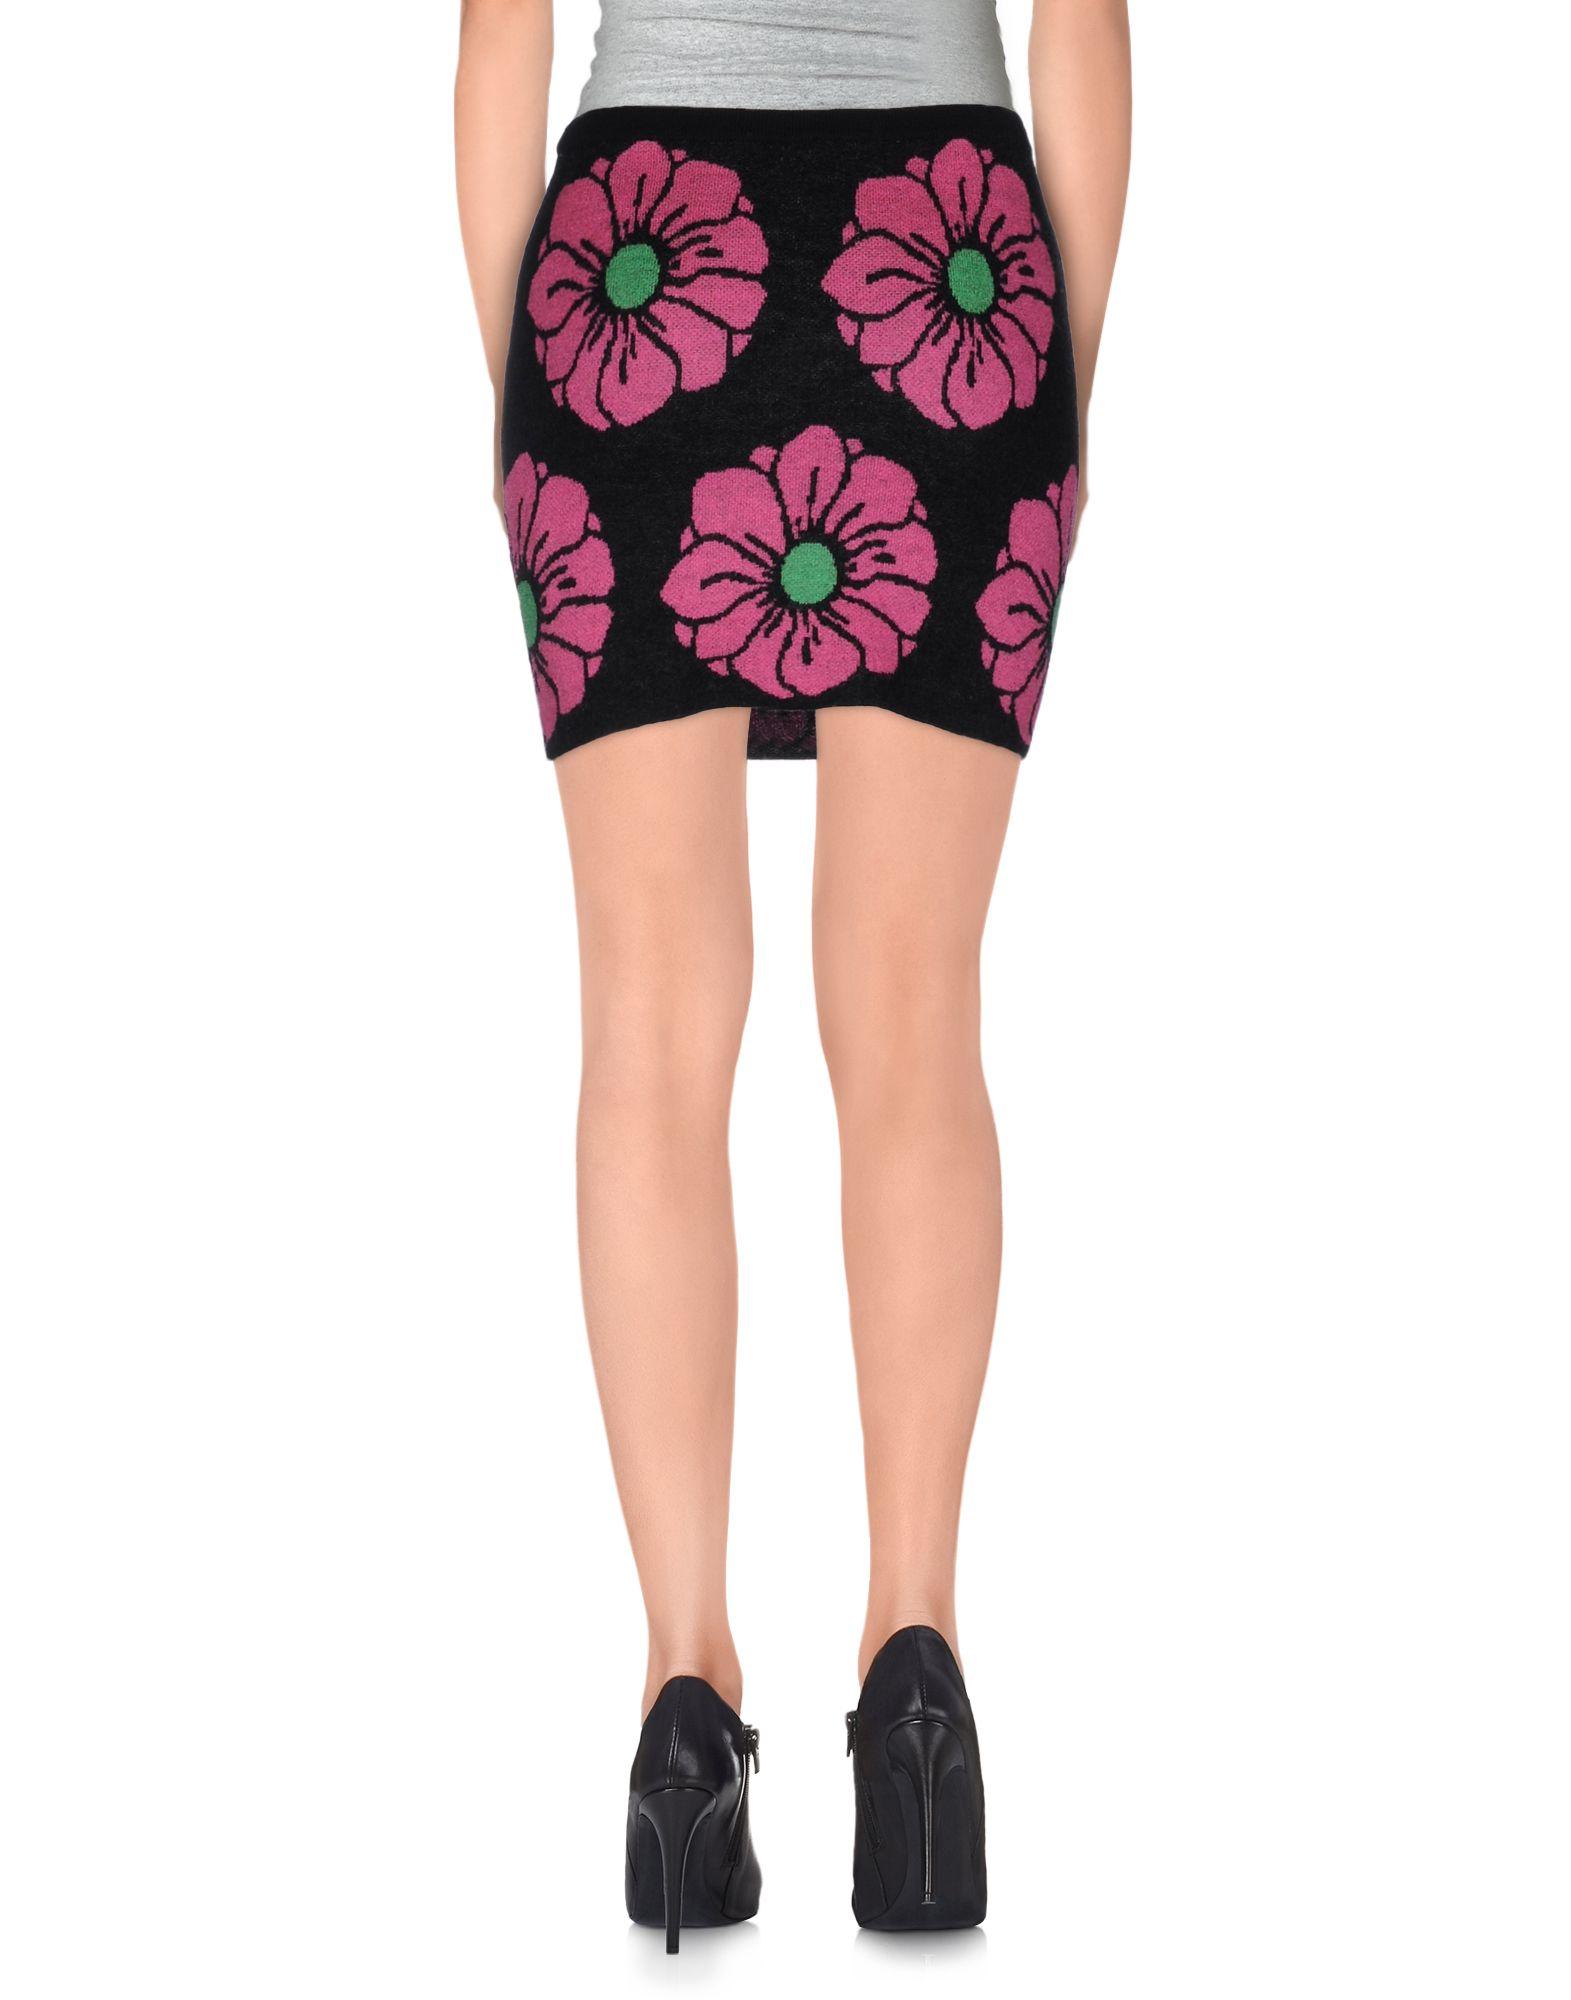 beayukmui knee length skirt in floral black save 63